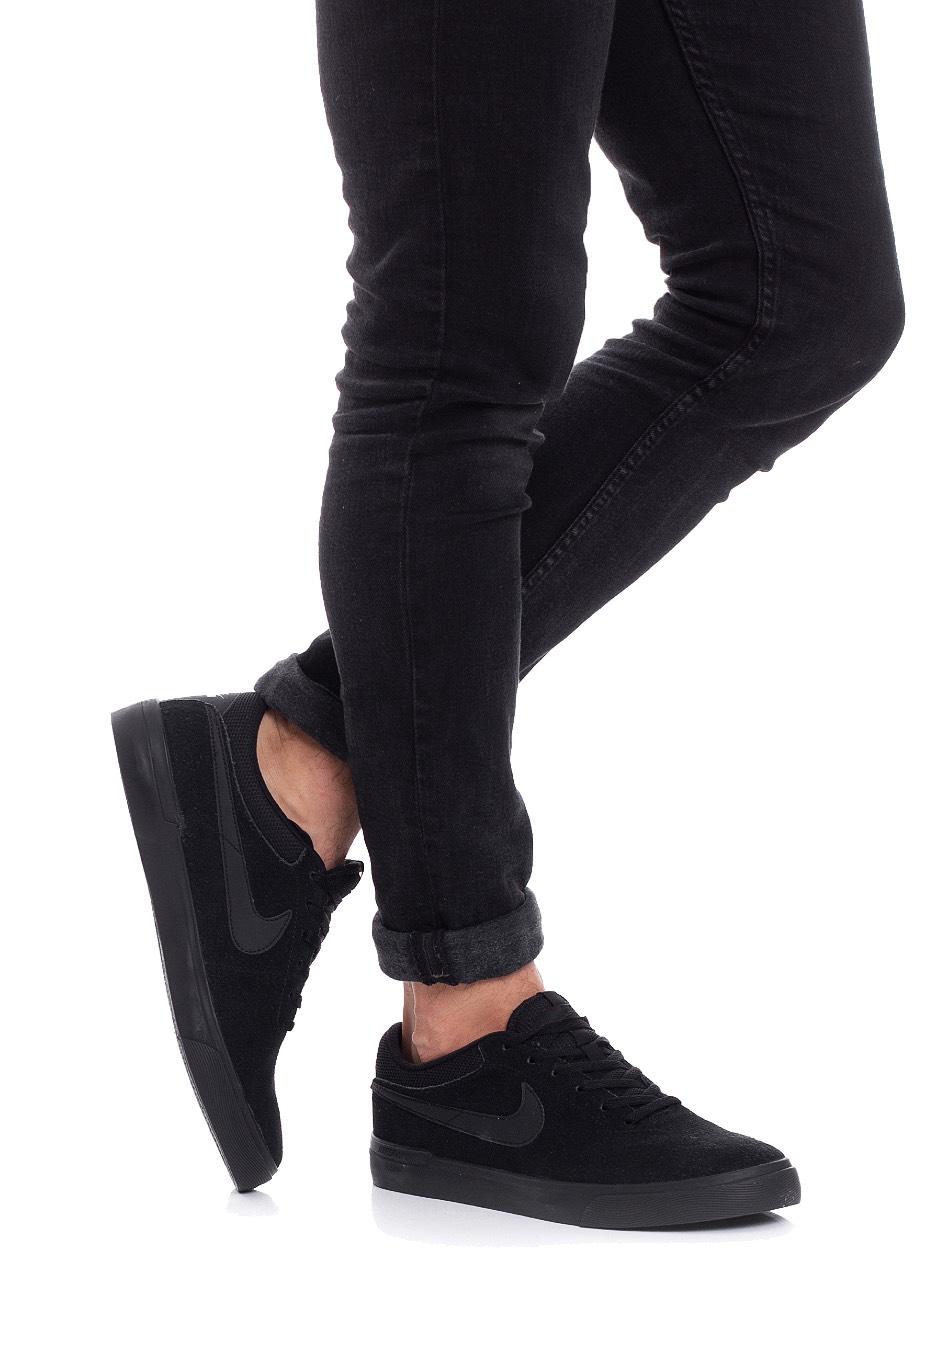 Nike SB - Koston Hypervulc Black/Black